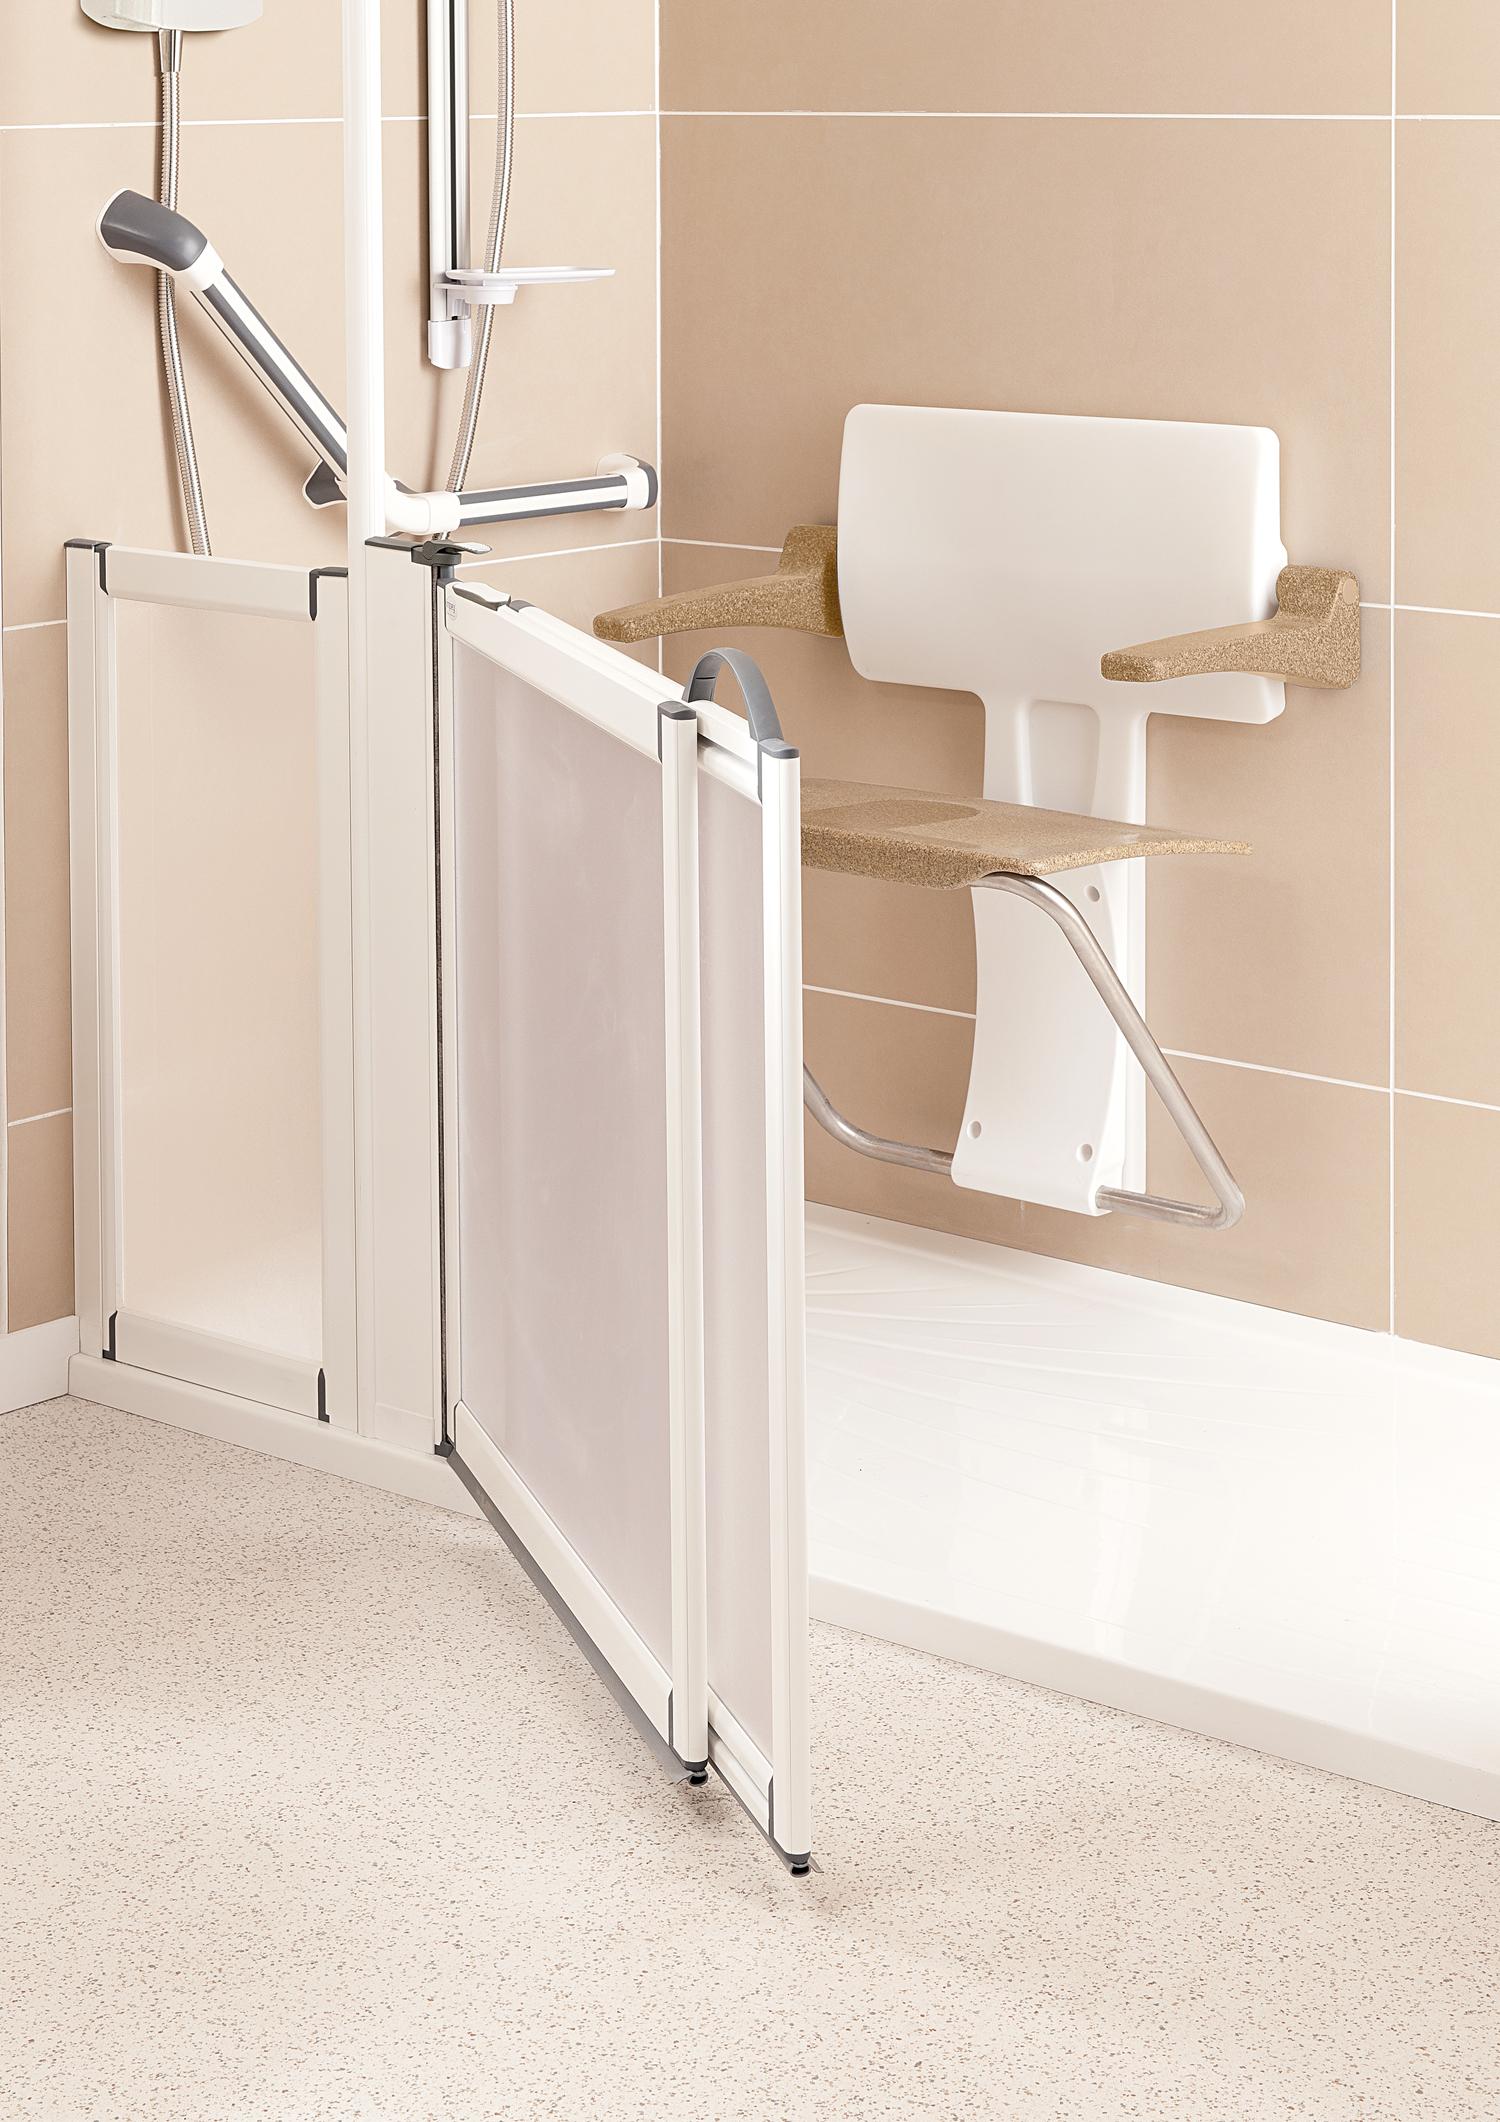 Slimfold shower seat roomset